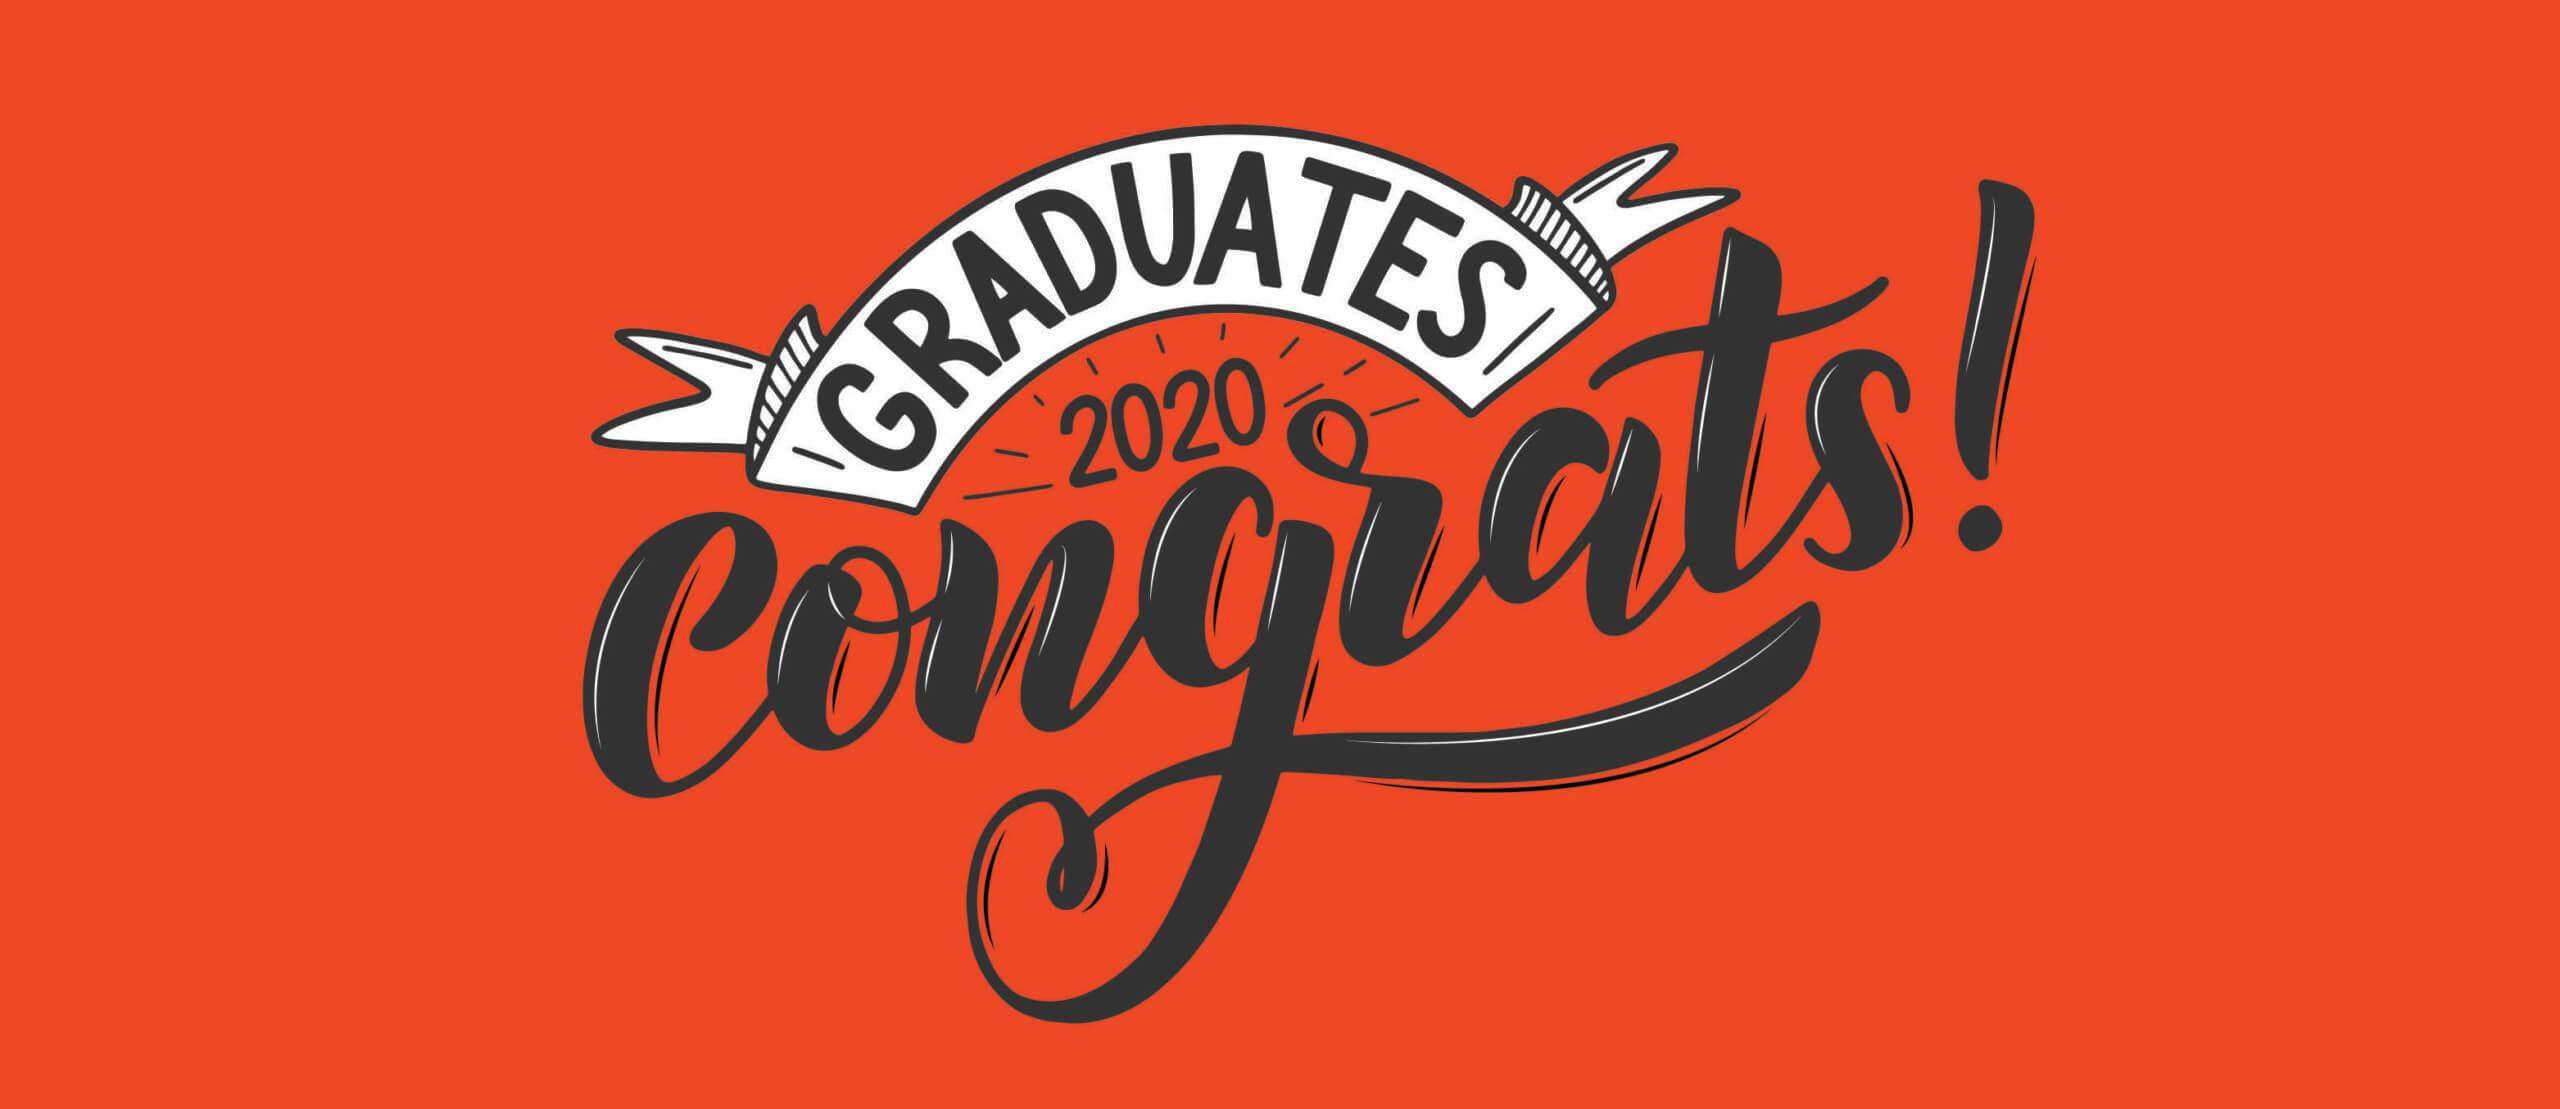 """Congrats 2020 Graduates"" script on a orange background"